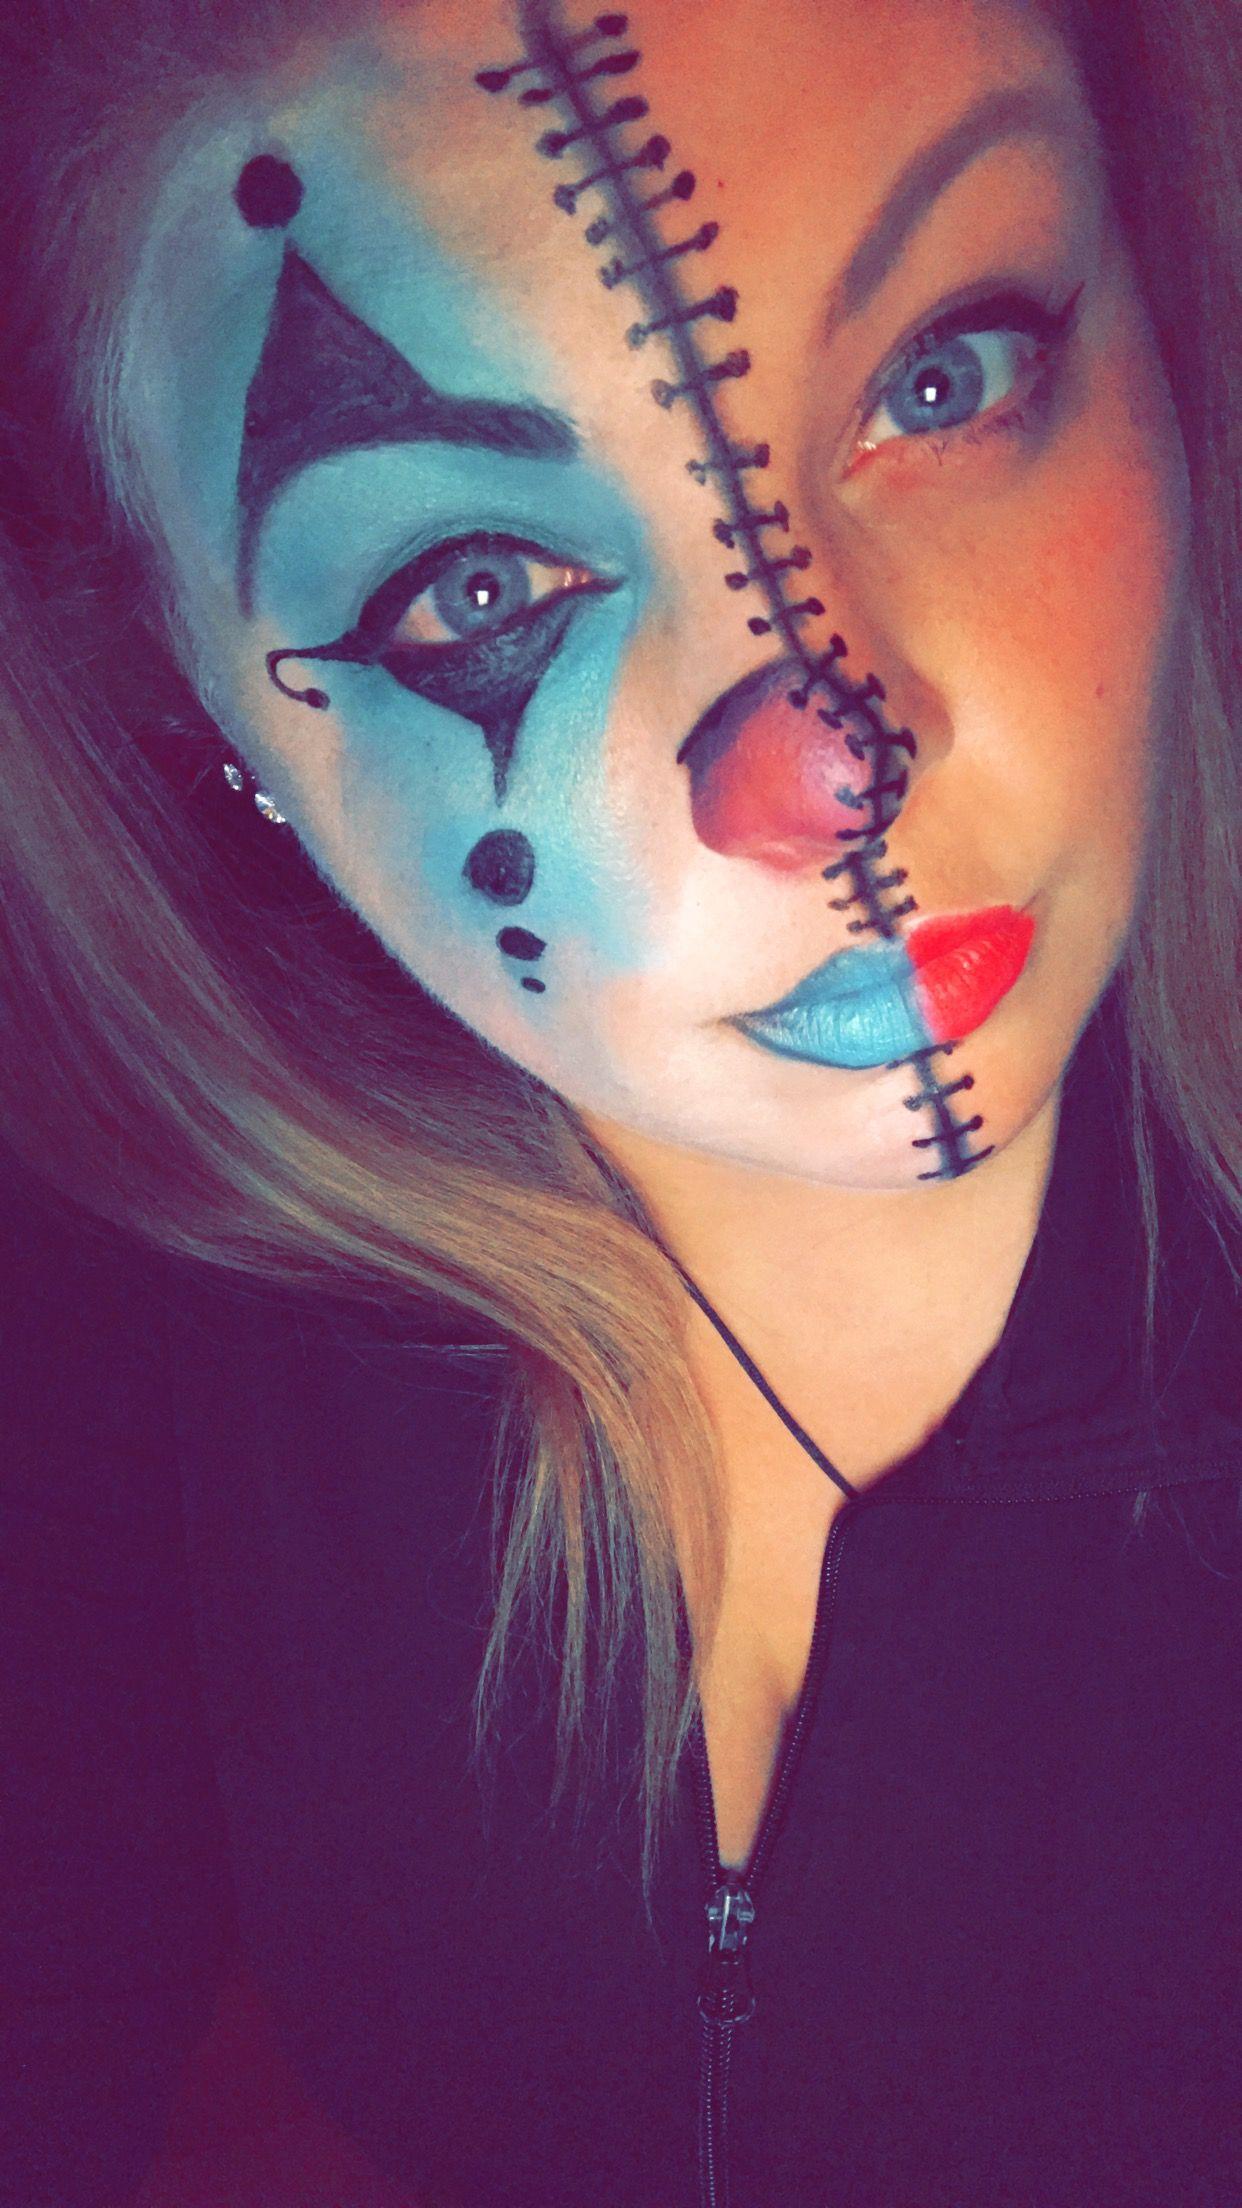 Pin by MKBeauty on Makeup Tutorials Makeup tutorial